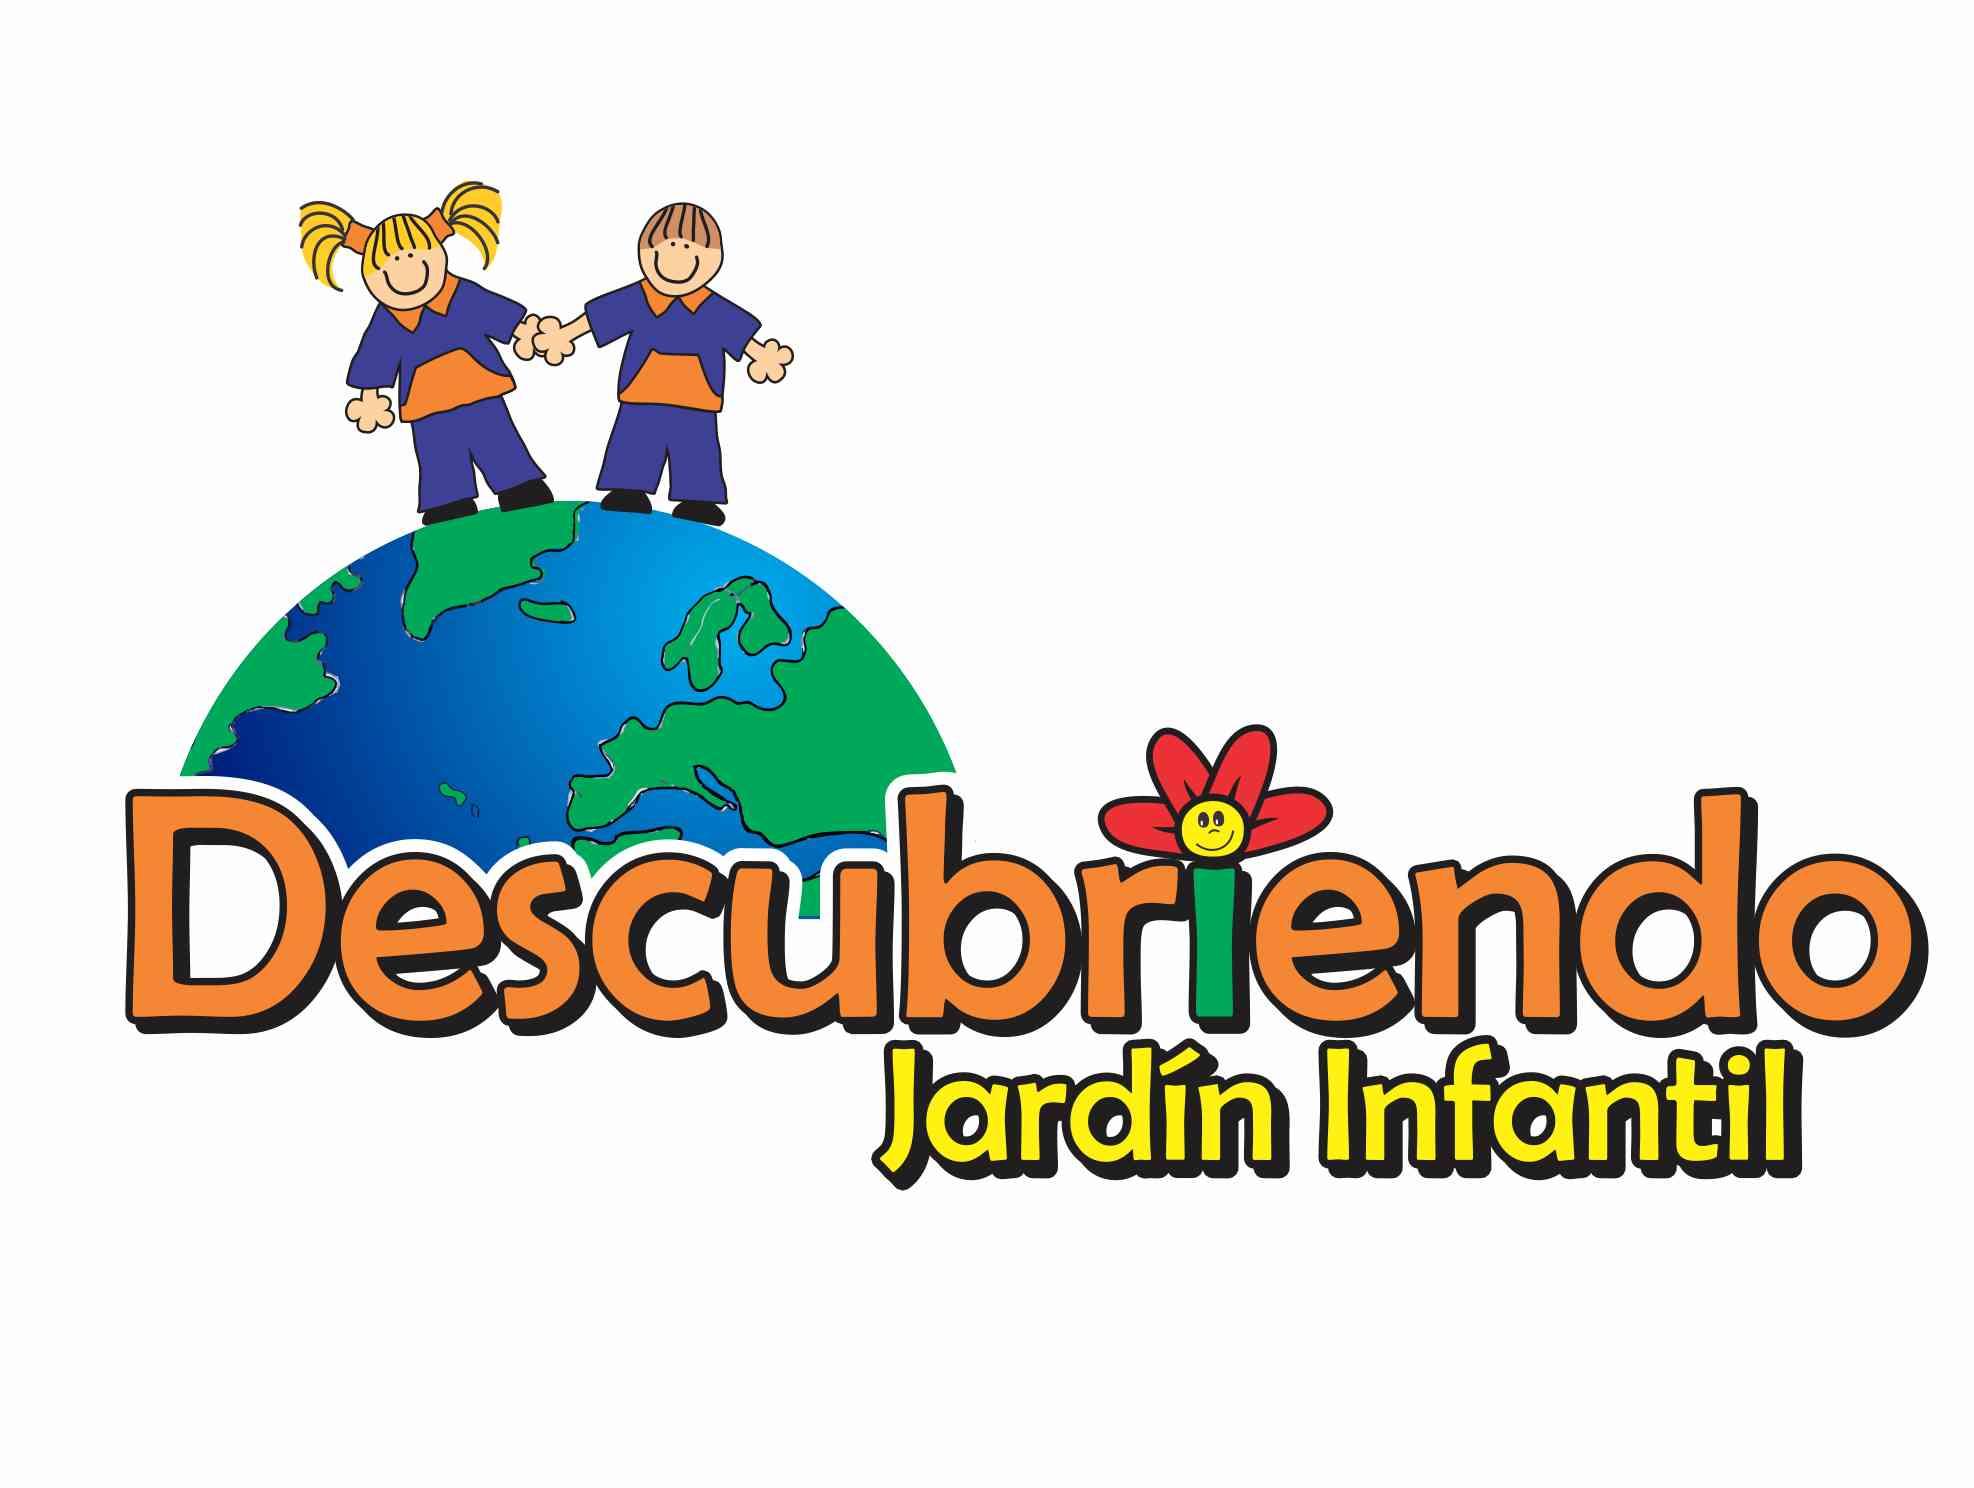 Descubriendo Jardin Infantil